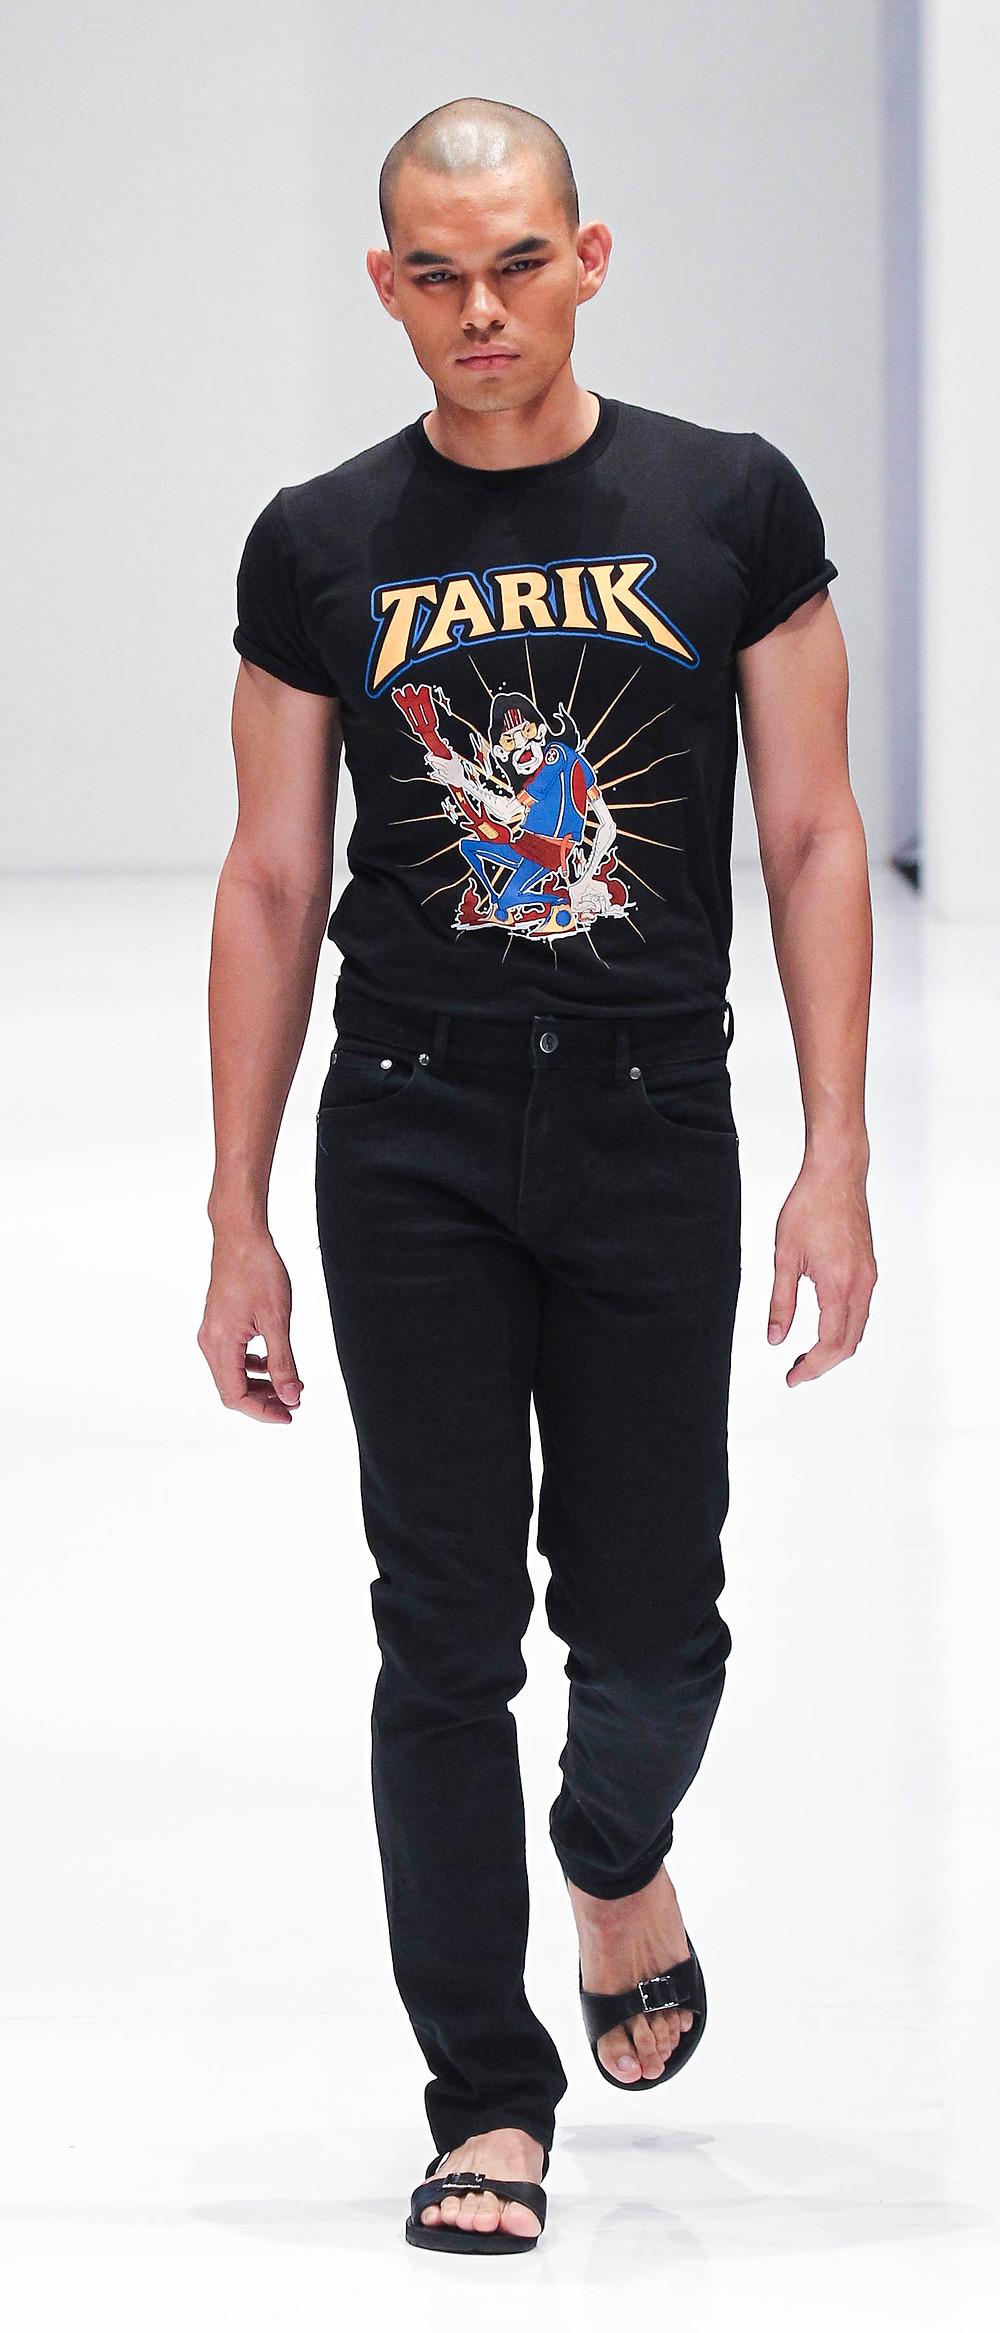 Tarik Jeans by Jiman Casablancas at KLFWRTW2016 : Kuala Lumpur Fashion Week RTW 2016